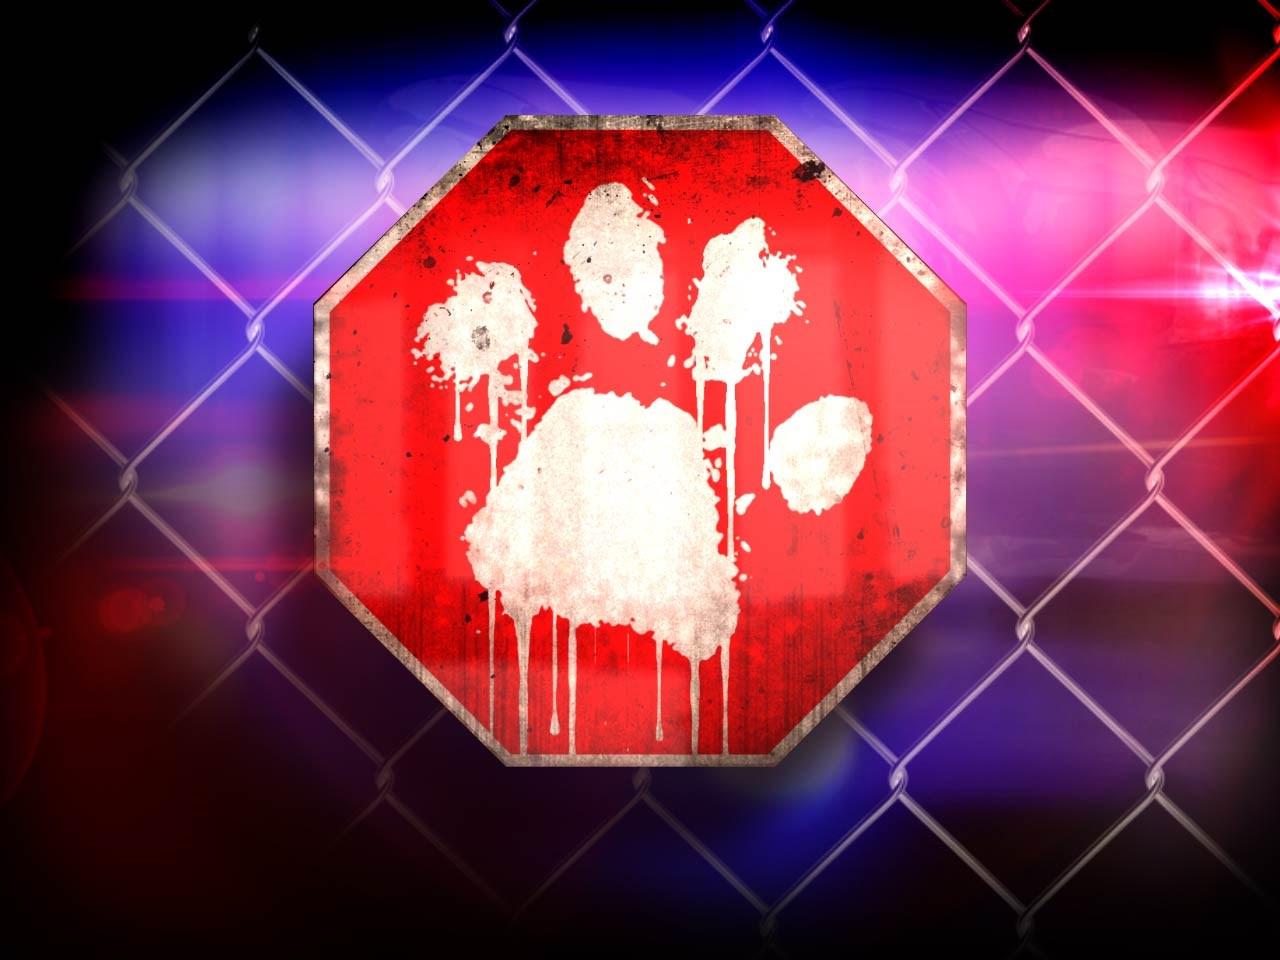 animal abuse graphic